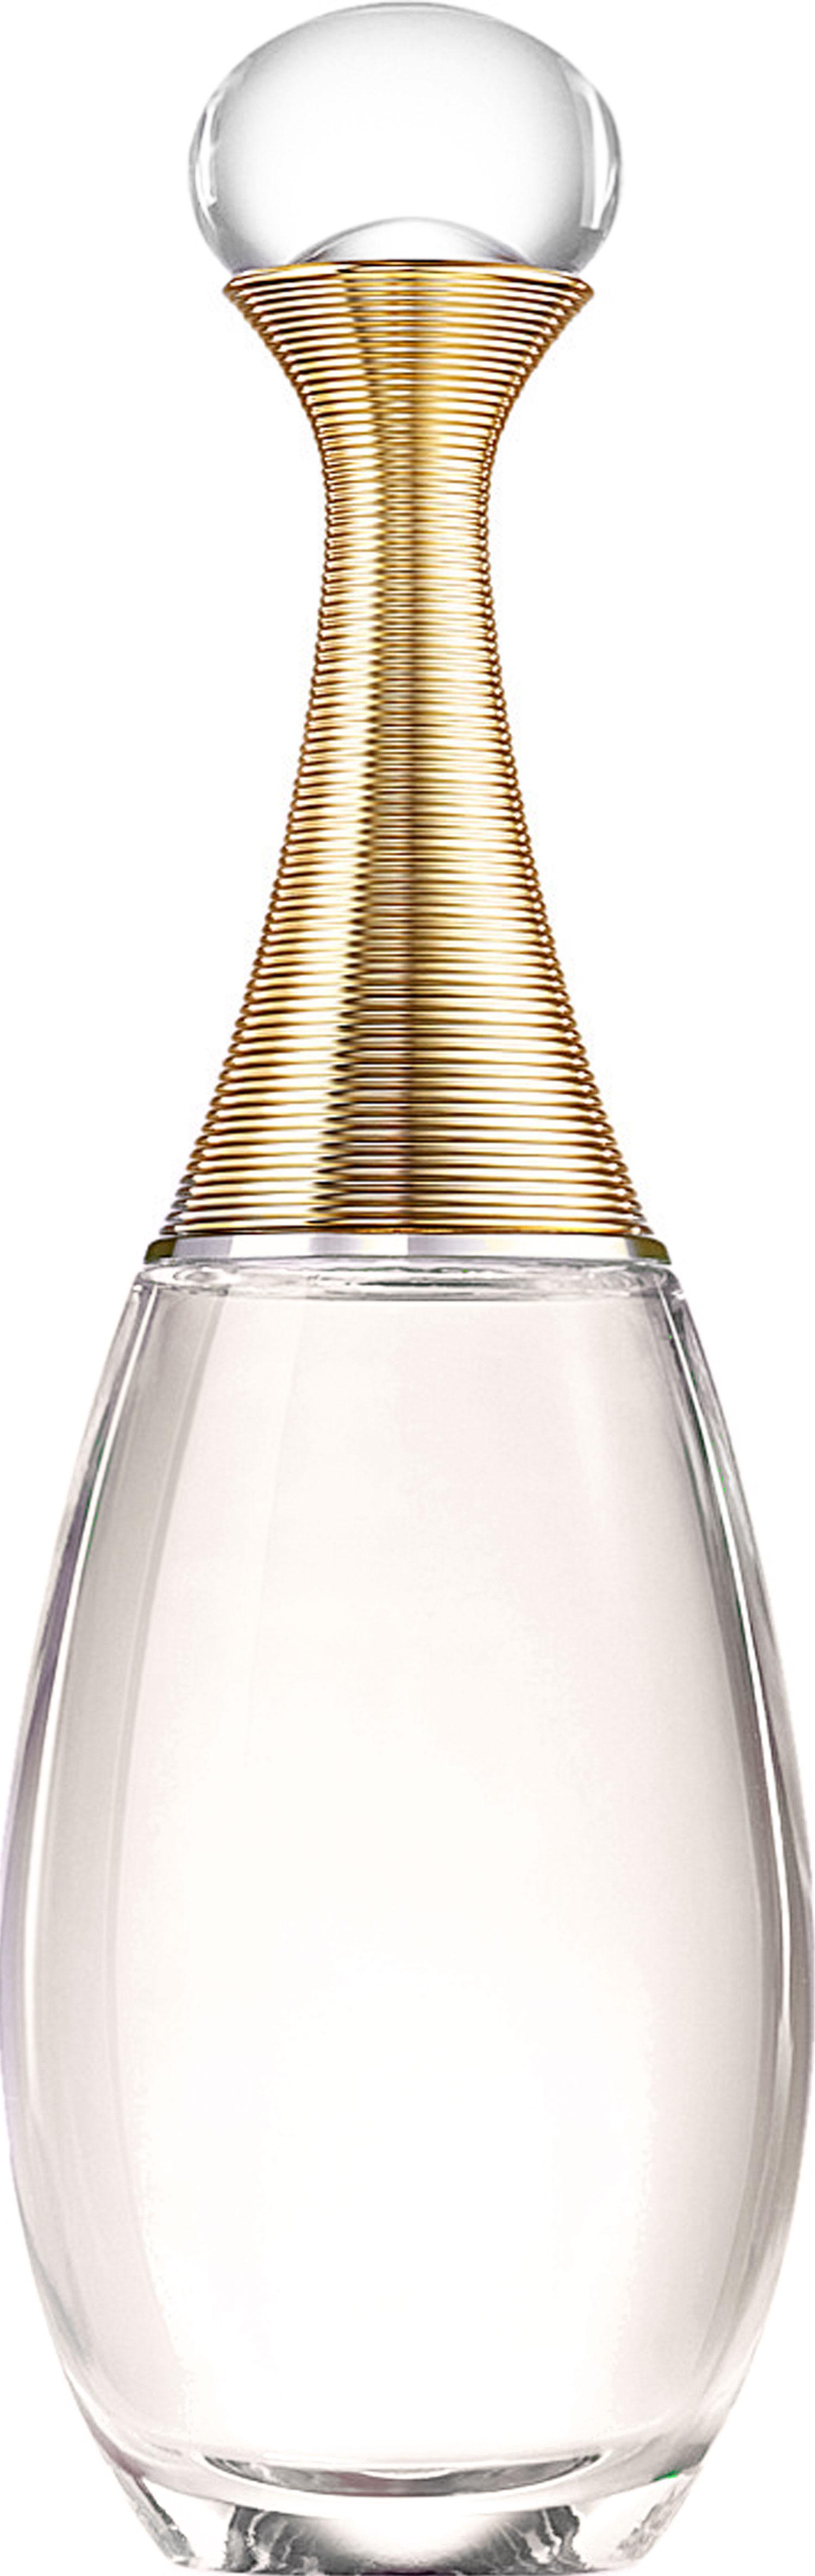 Christian Dior Jadore Eau Dete Summer туалетная вода 100мл тестер (Критиан Диор Жадор Летняя Вода)